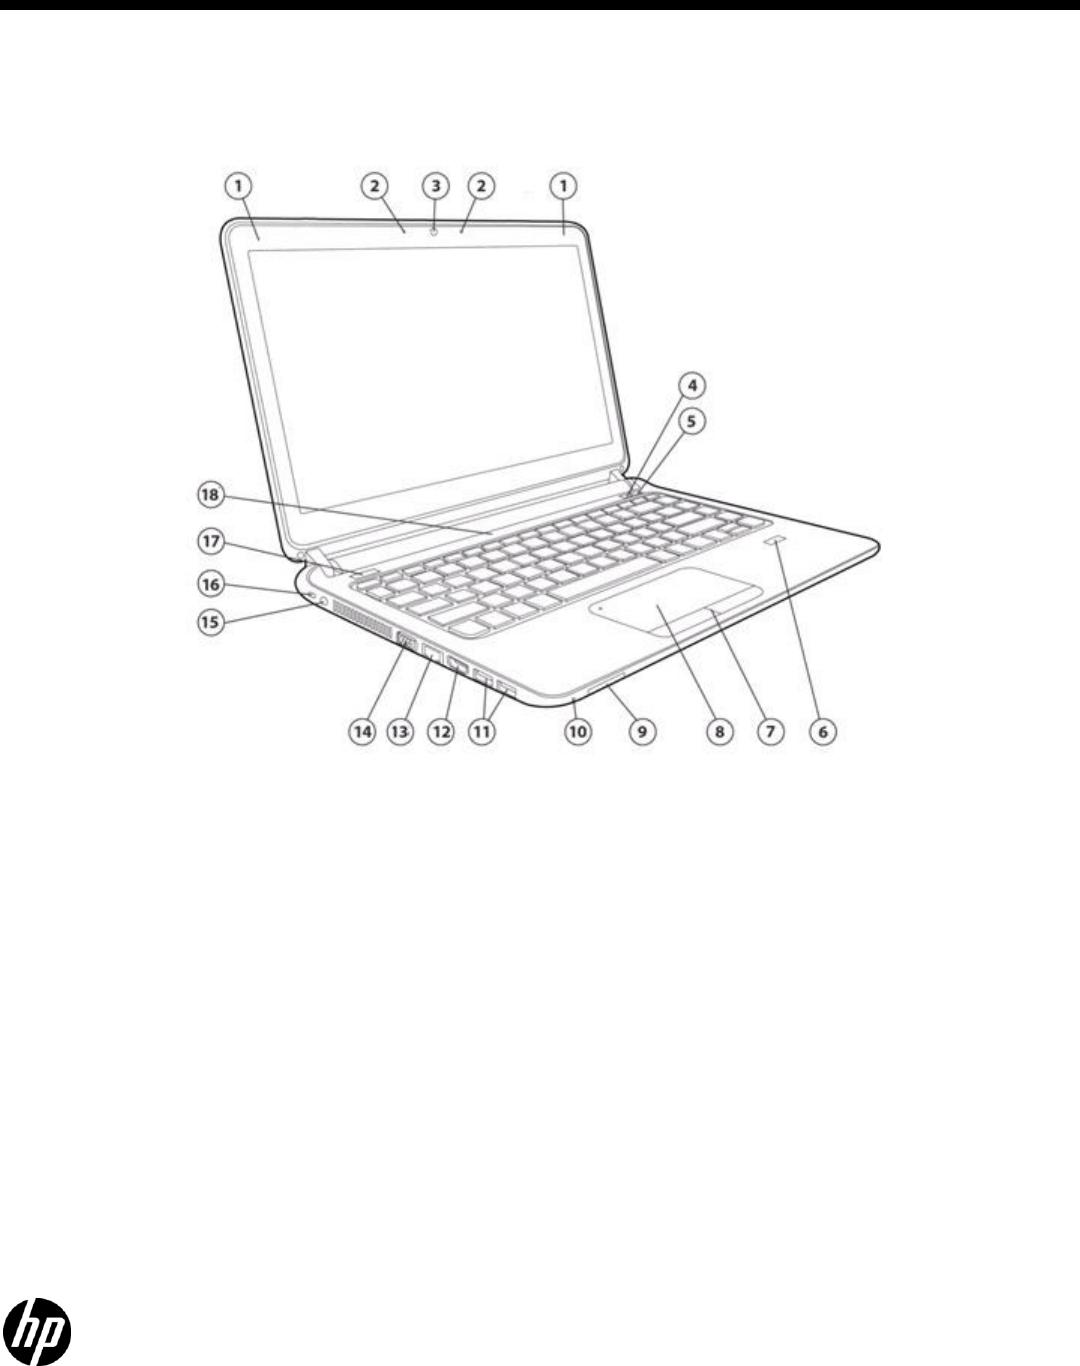 hp probook 450 g2 bedienungsanleitung HP ProBook Models